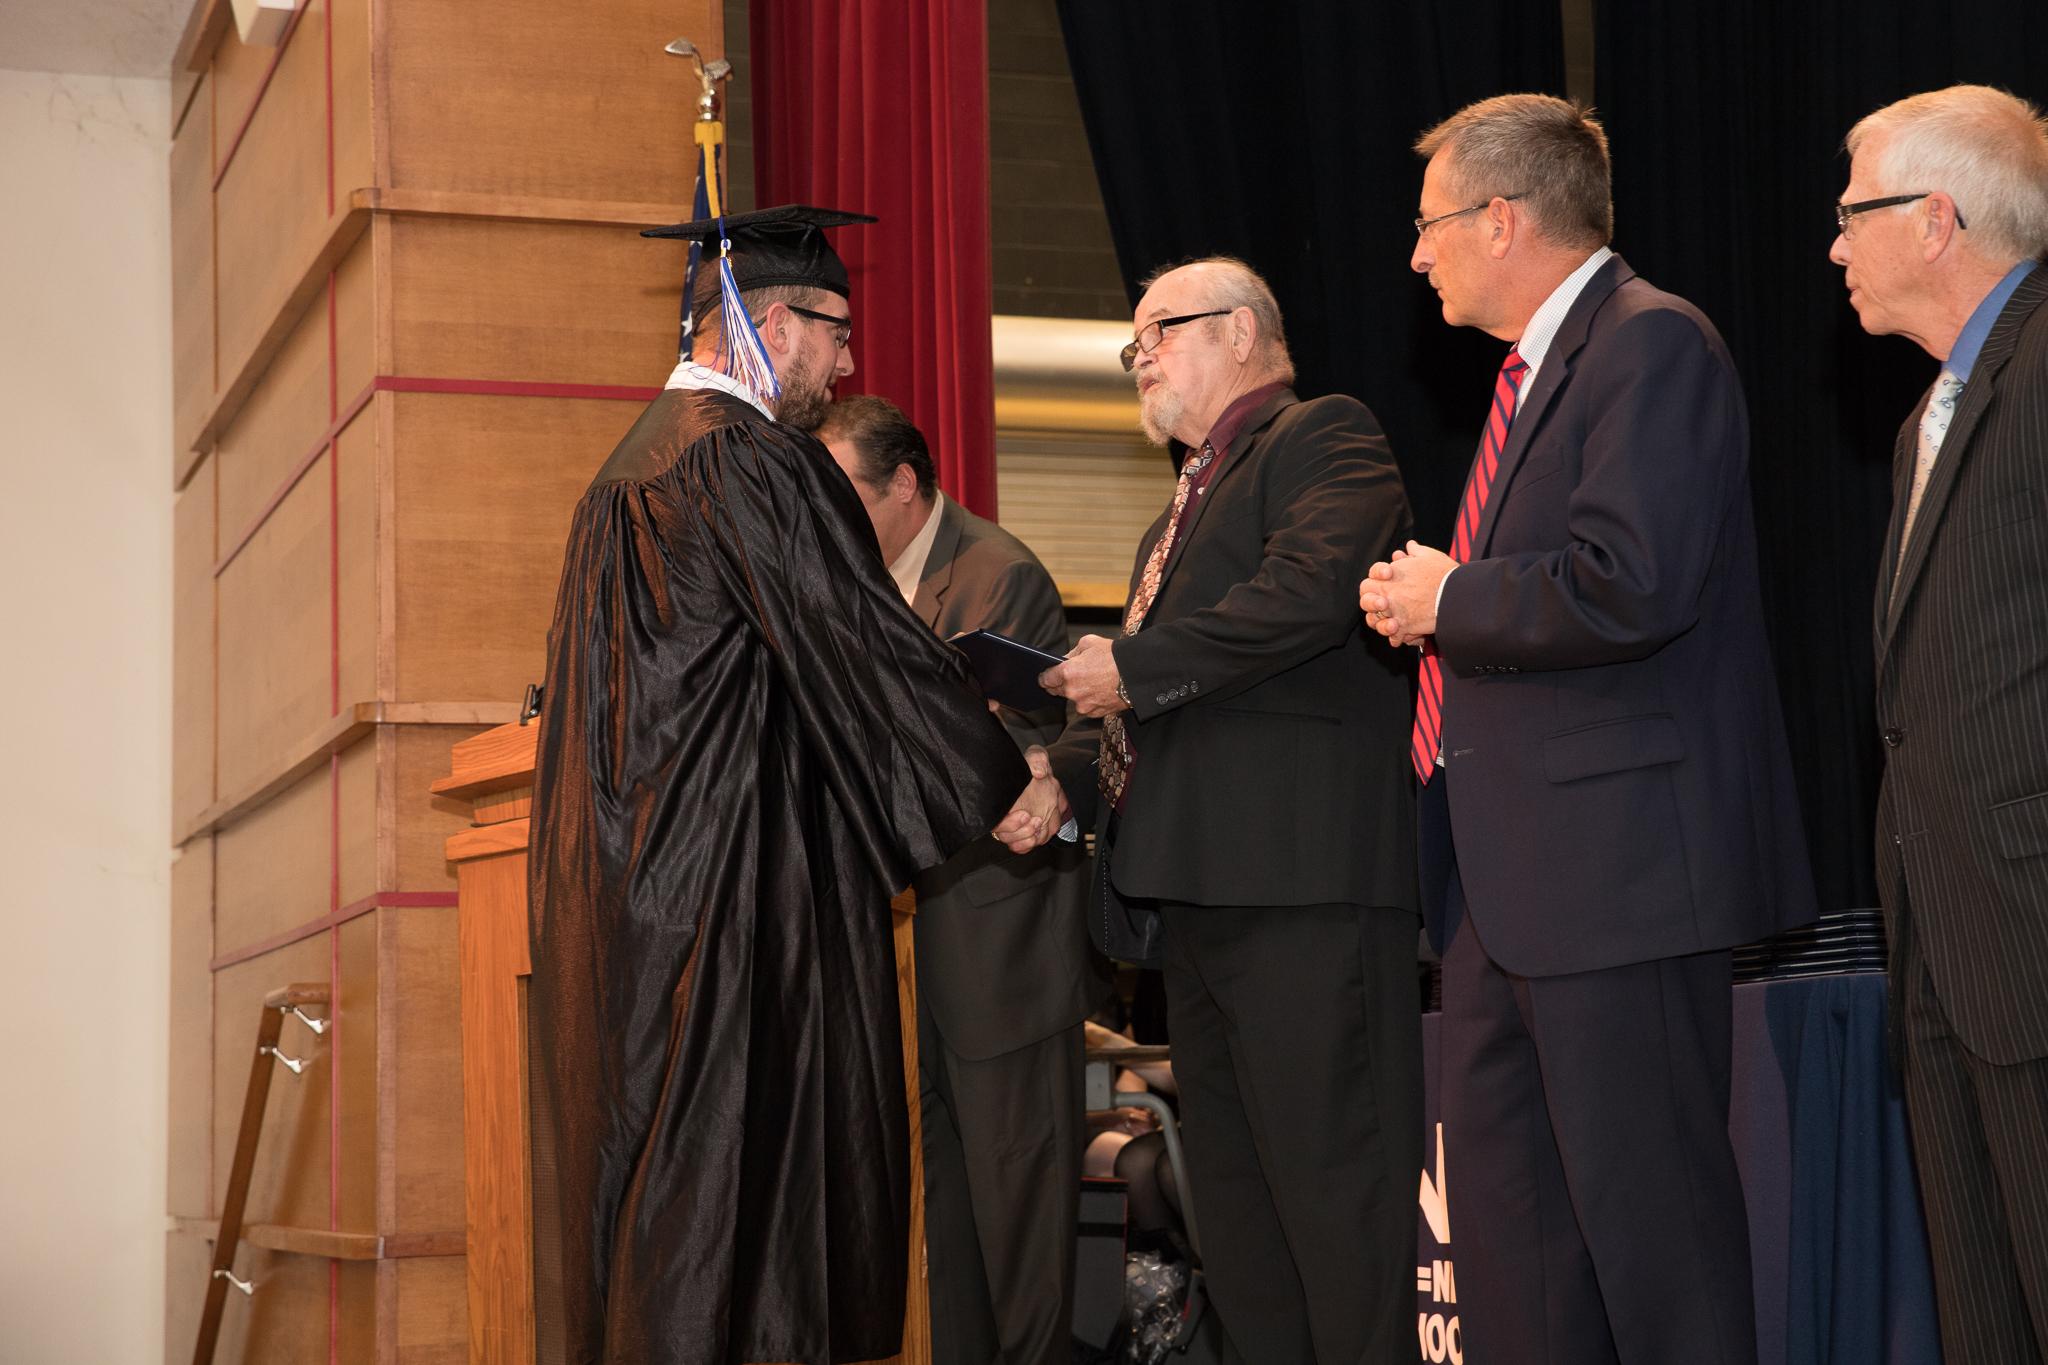 ncst_fall_2017_graduation-21.jpg